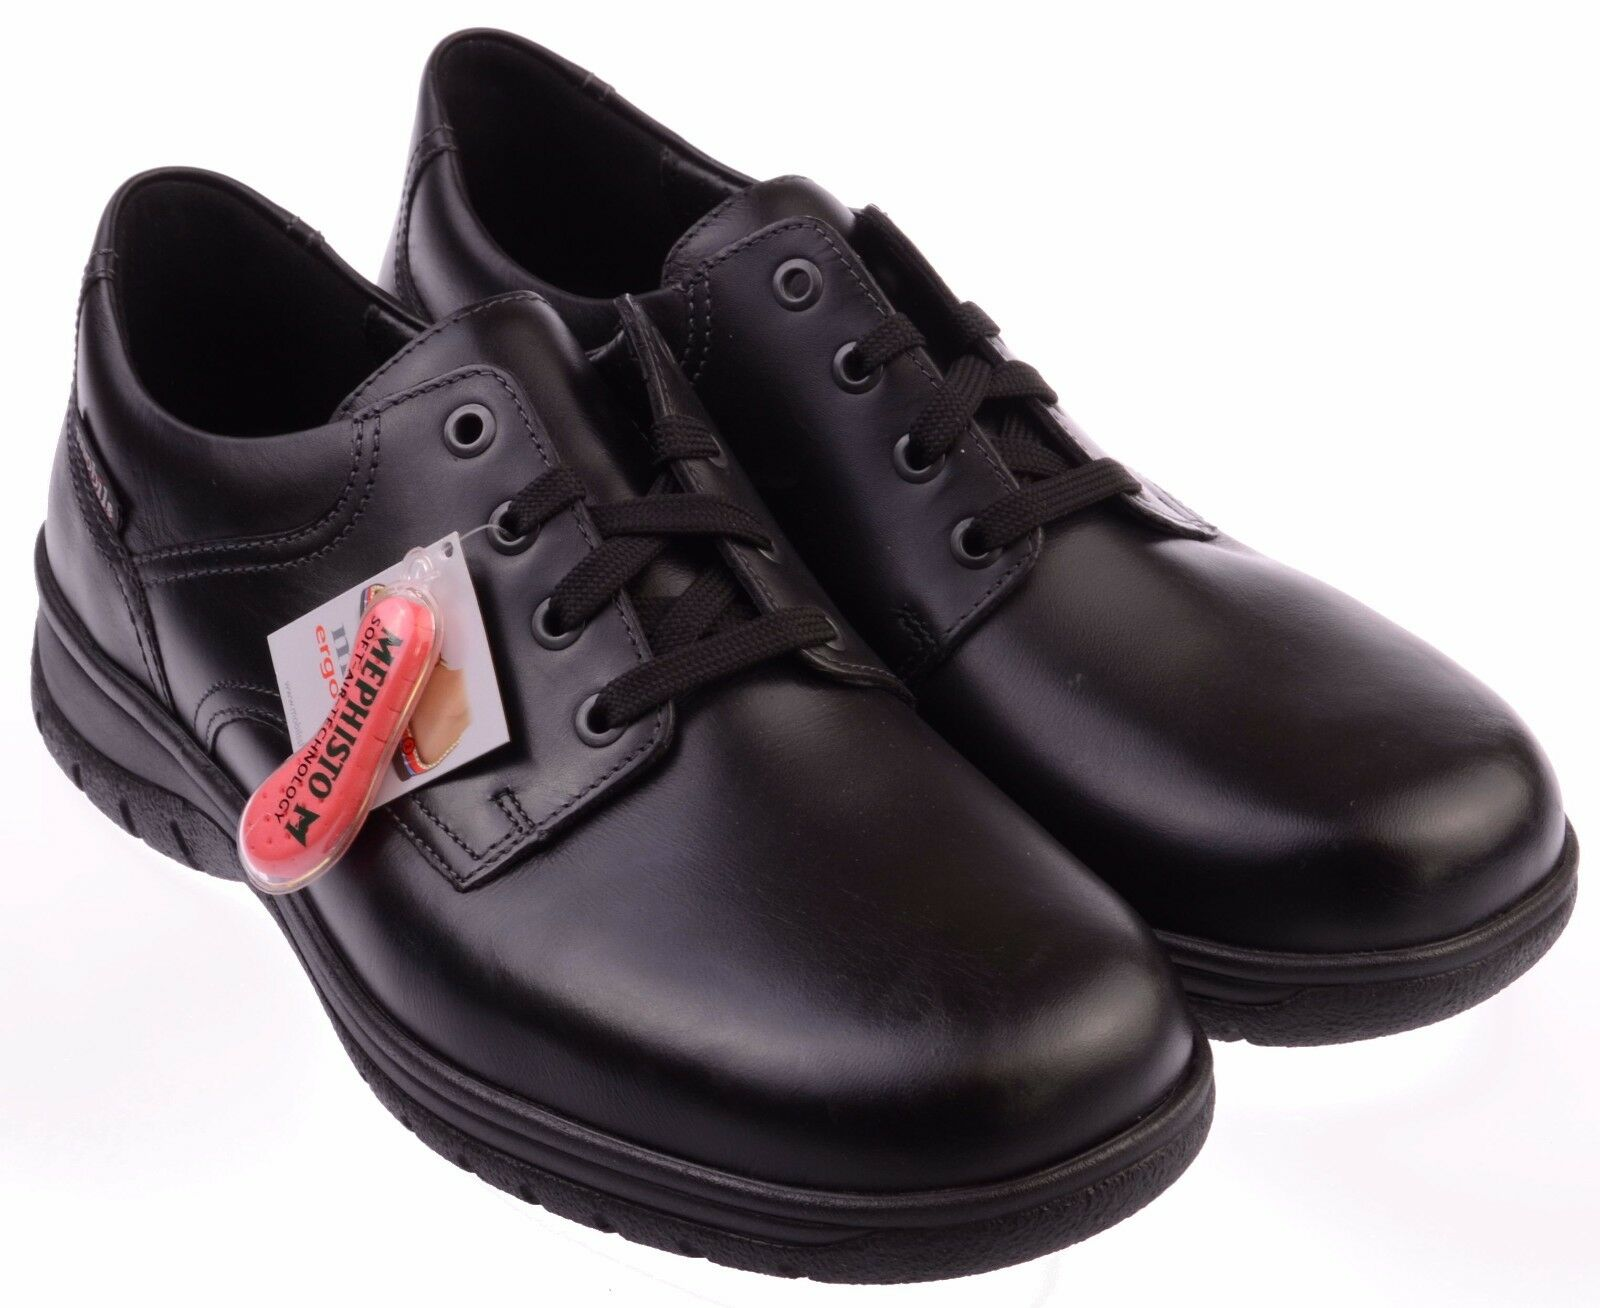 Homme à Lacets Formel Chaussures MEPHISTO Iago UK Noir Taille 9.5